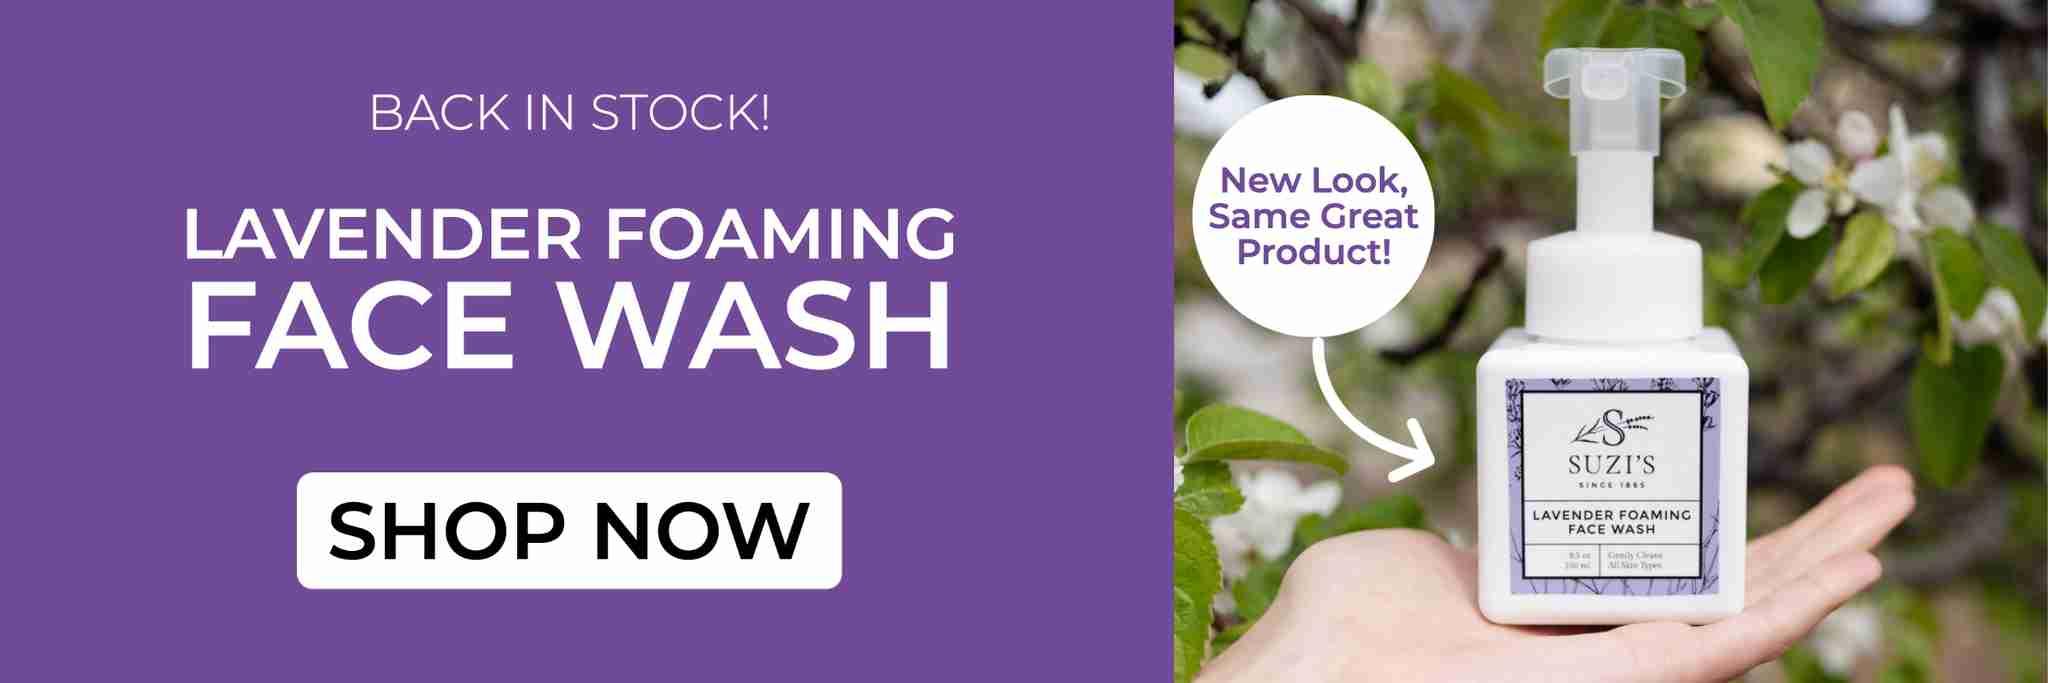 All Natural Foaming Face Wash With Lavender - Suzi's Lavender